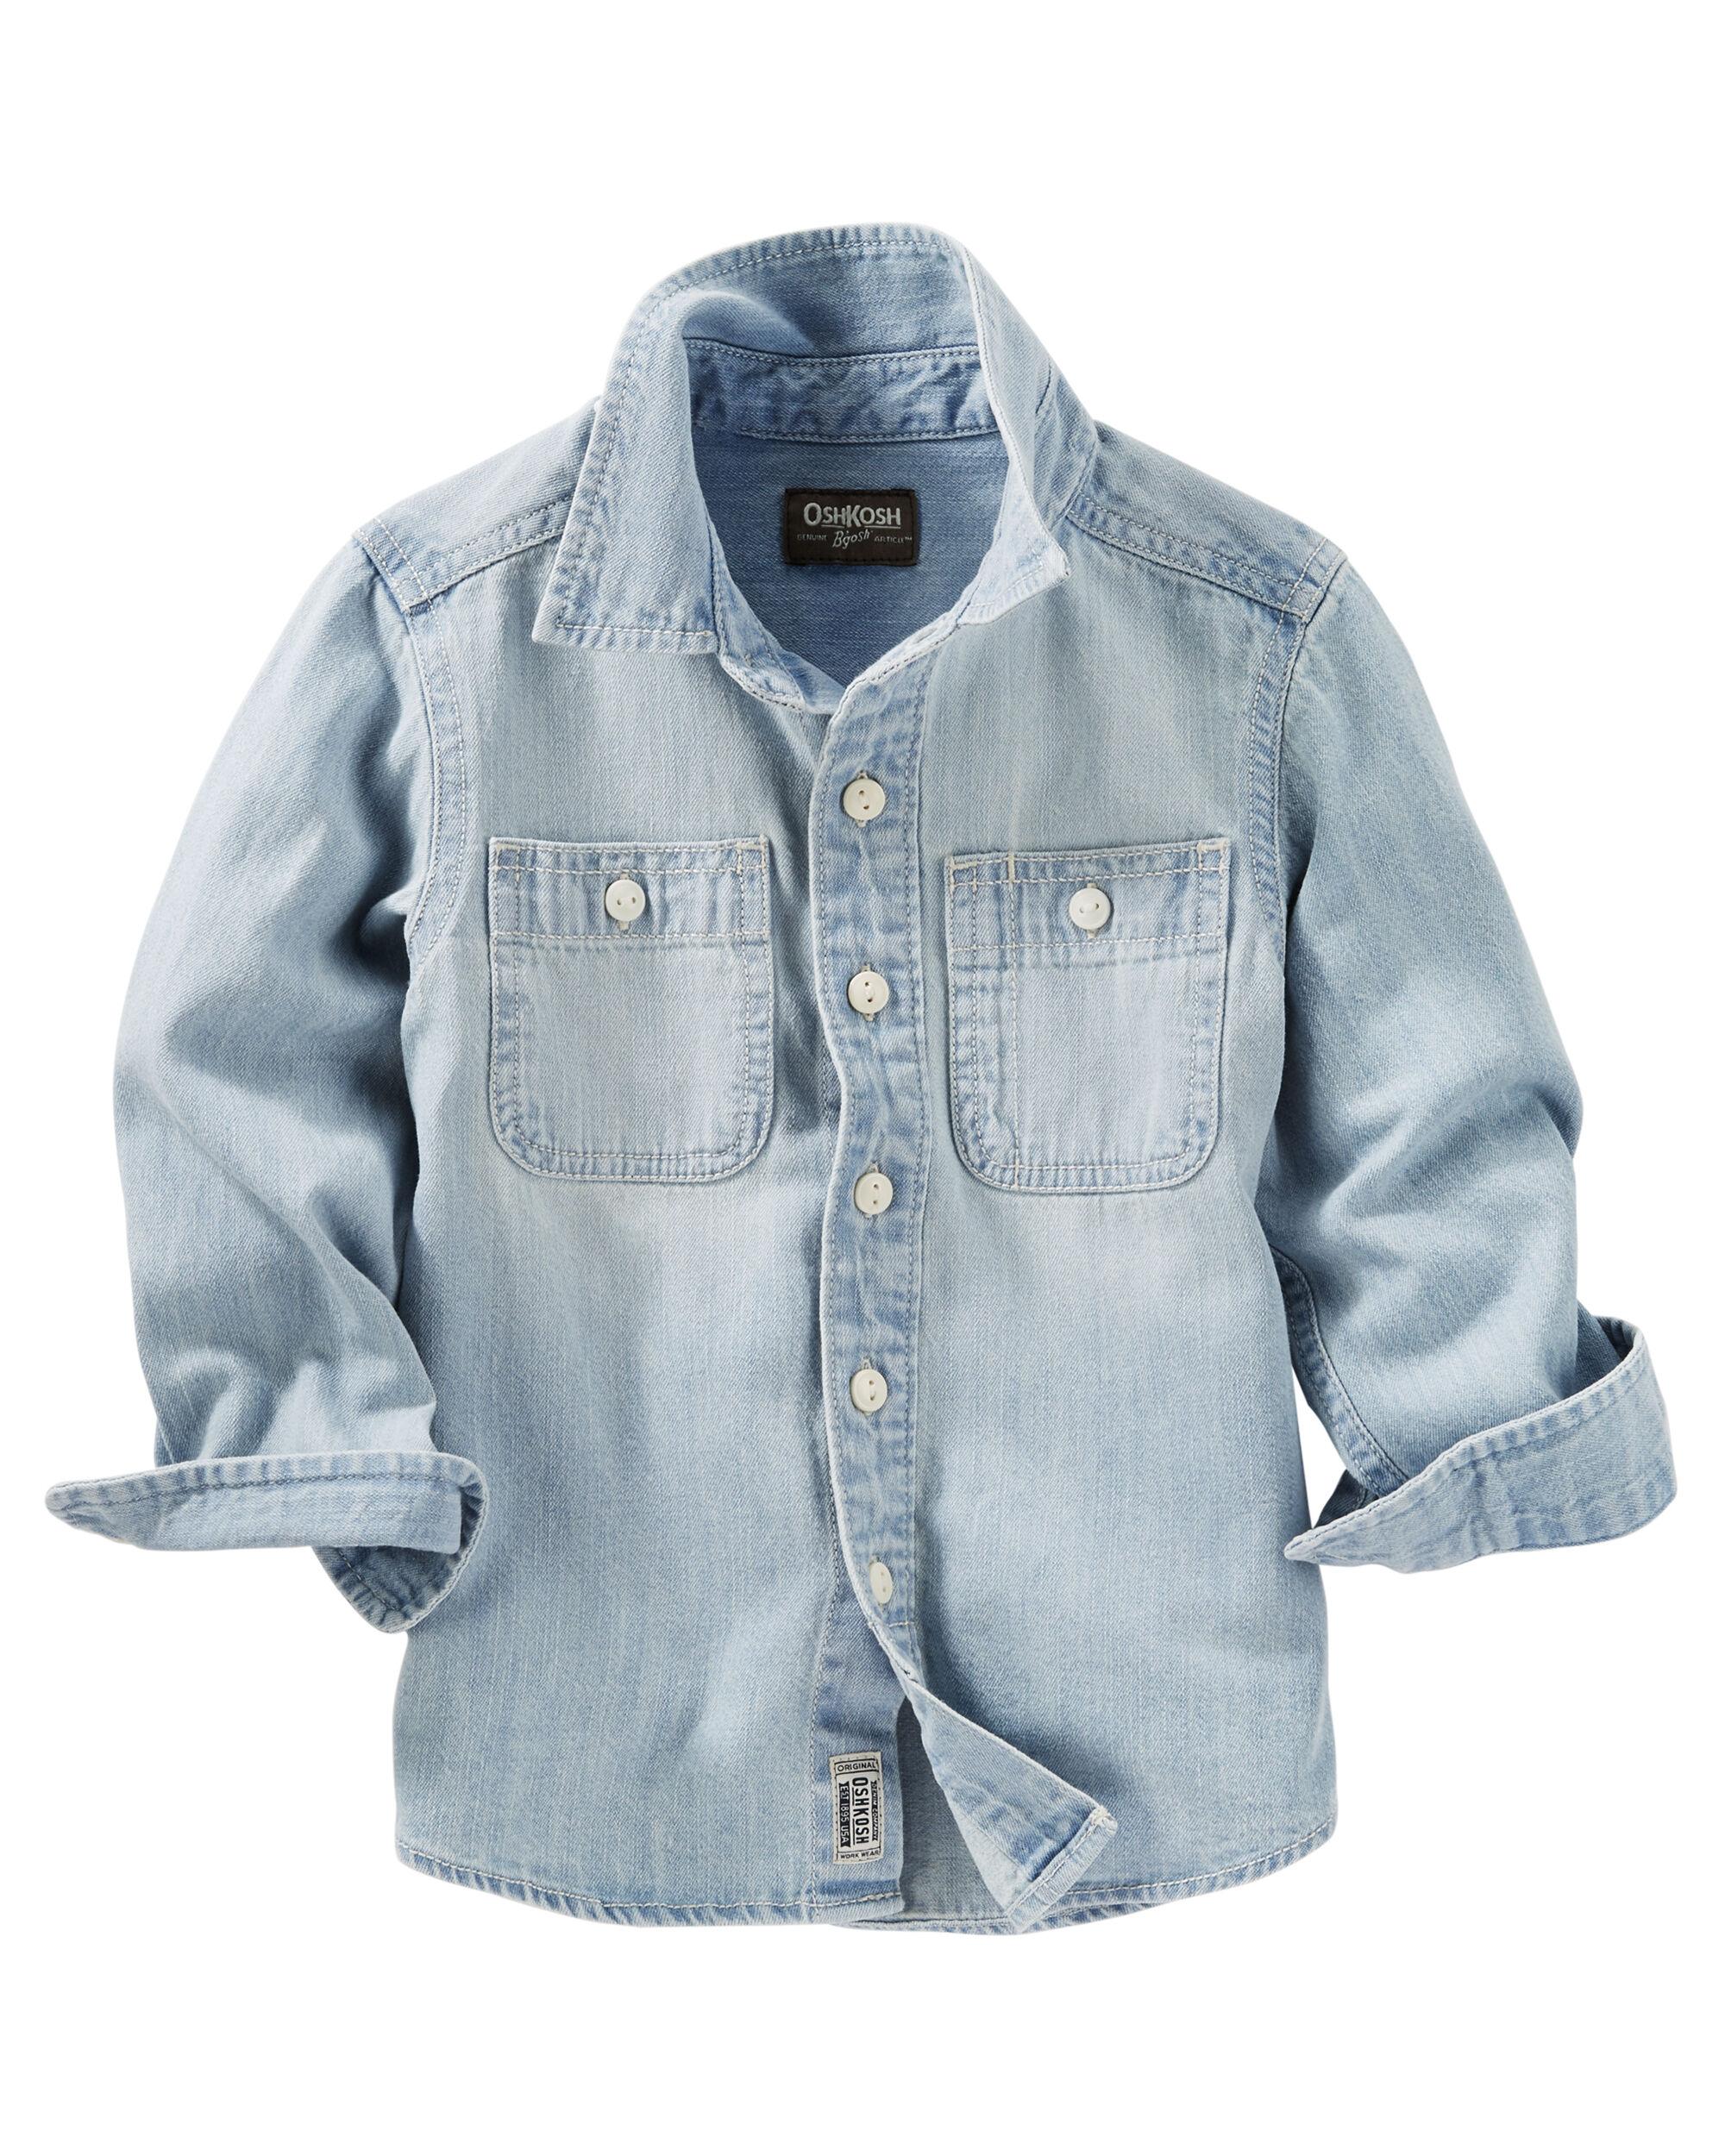 2 Pocket Button Front Chambray Shirt Oshkosh Com